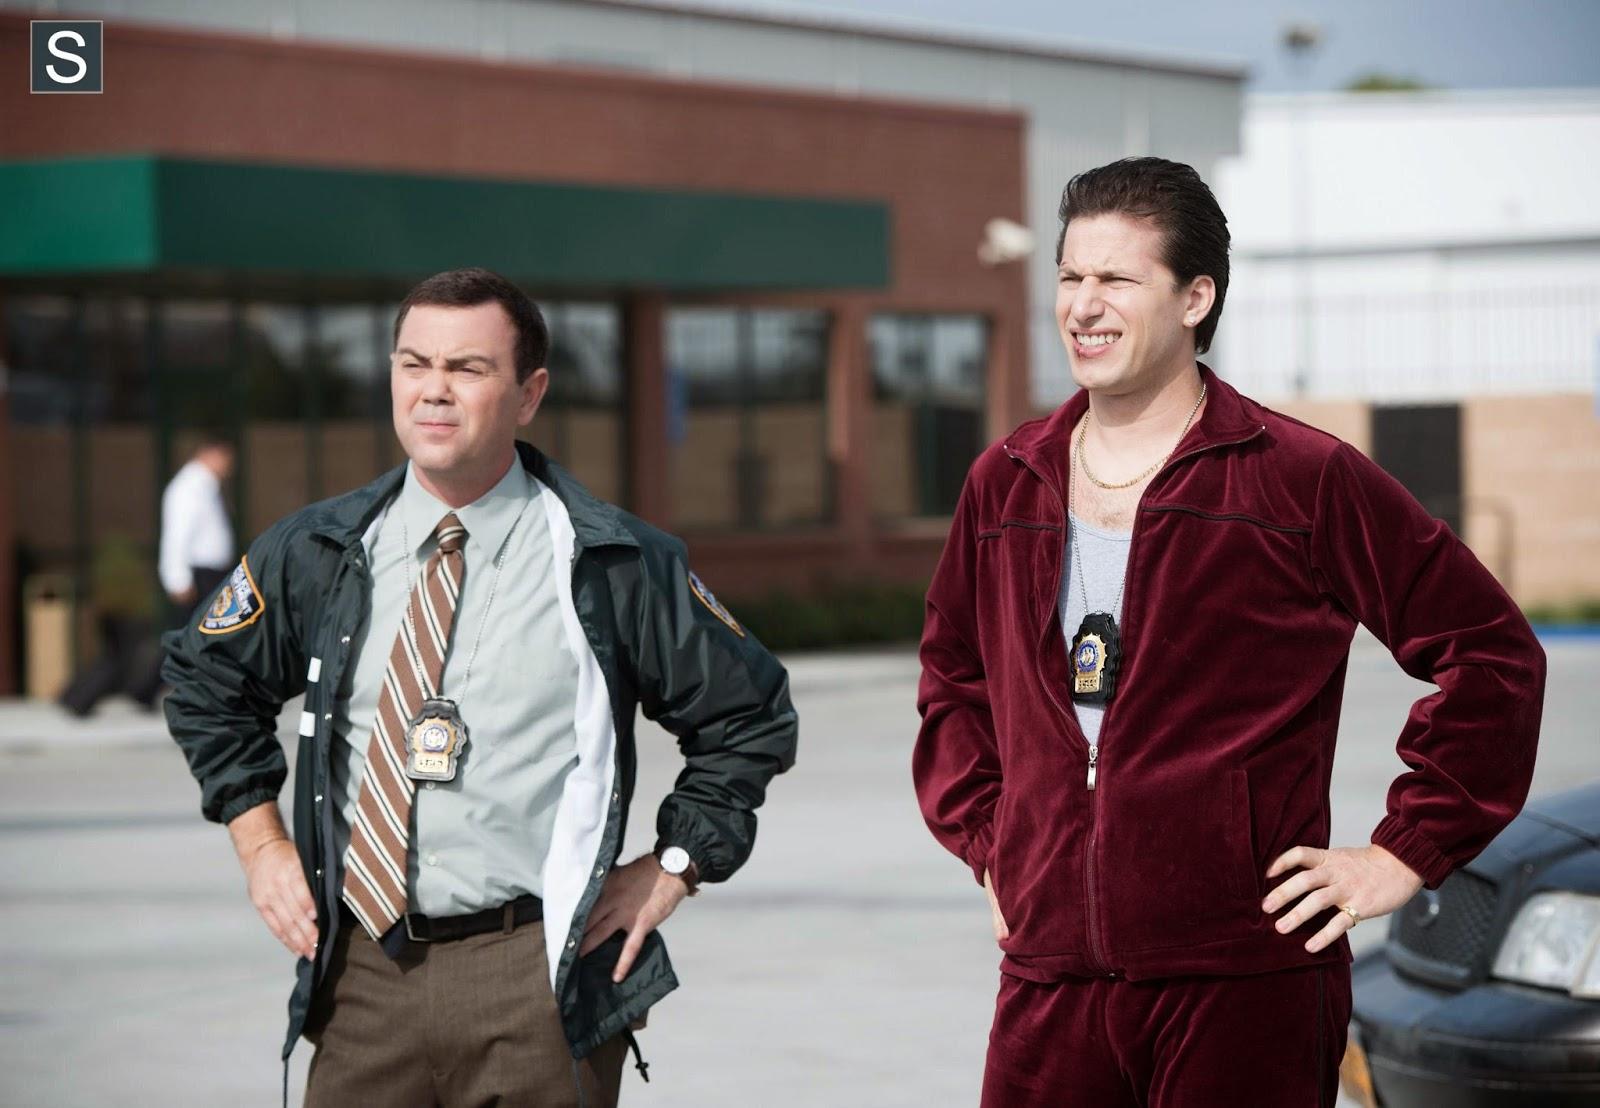 Brooklyn Nine-Nine - Episode 2.01 - Undercover - A Baker's Dozen Non-Spoilery Teases